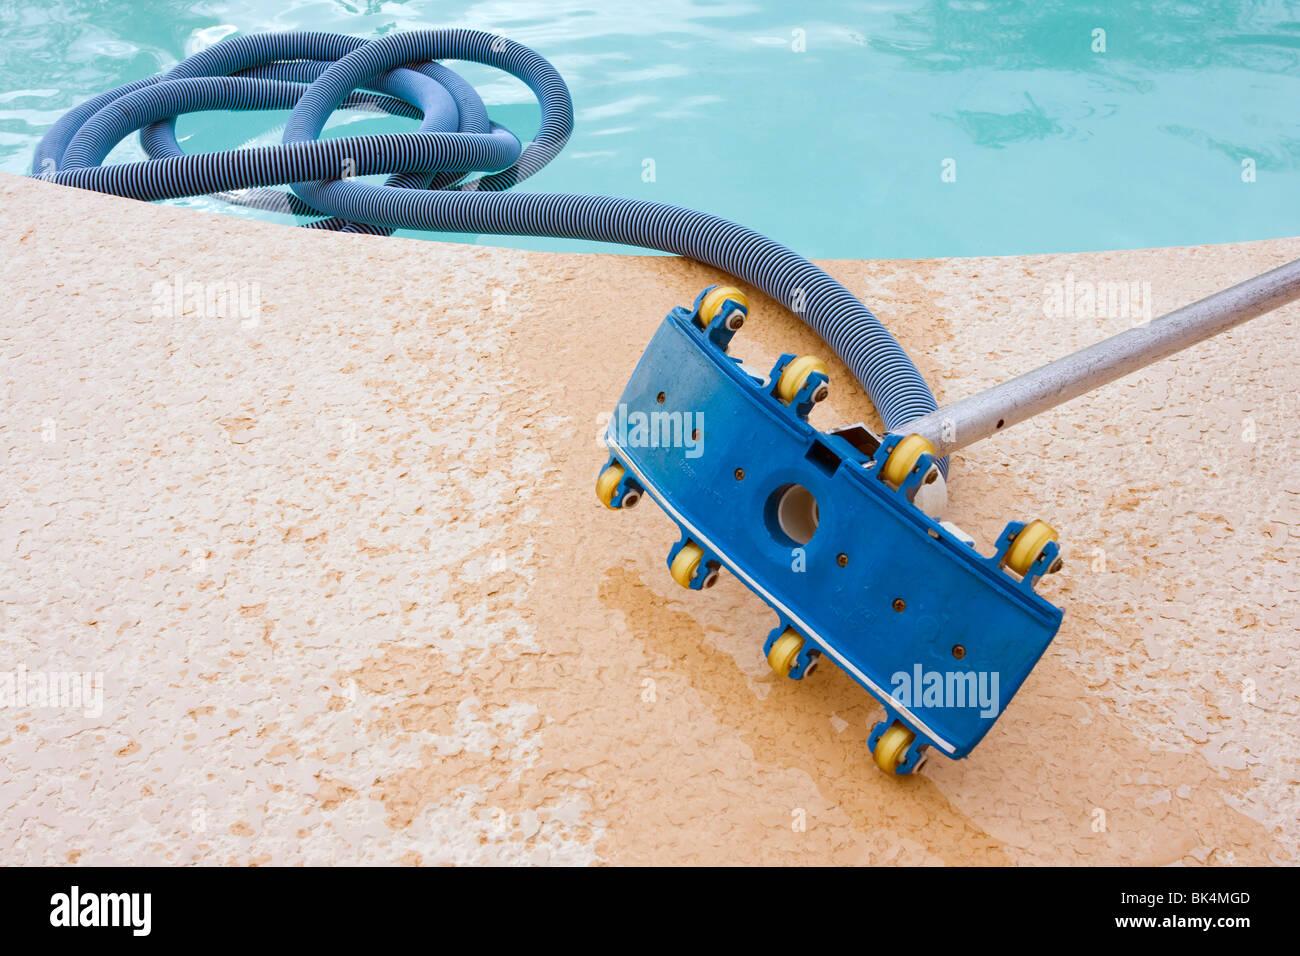 Swimming pool vacuum cleaner equipment Stock Photo: 28992781 - Alamy